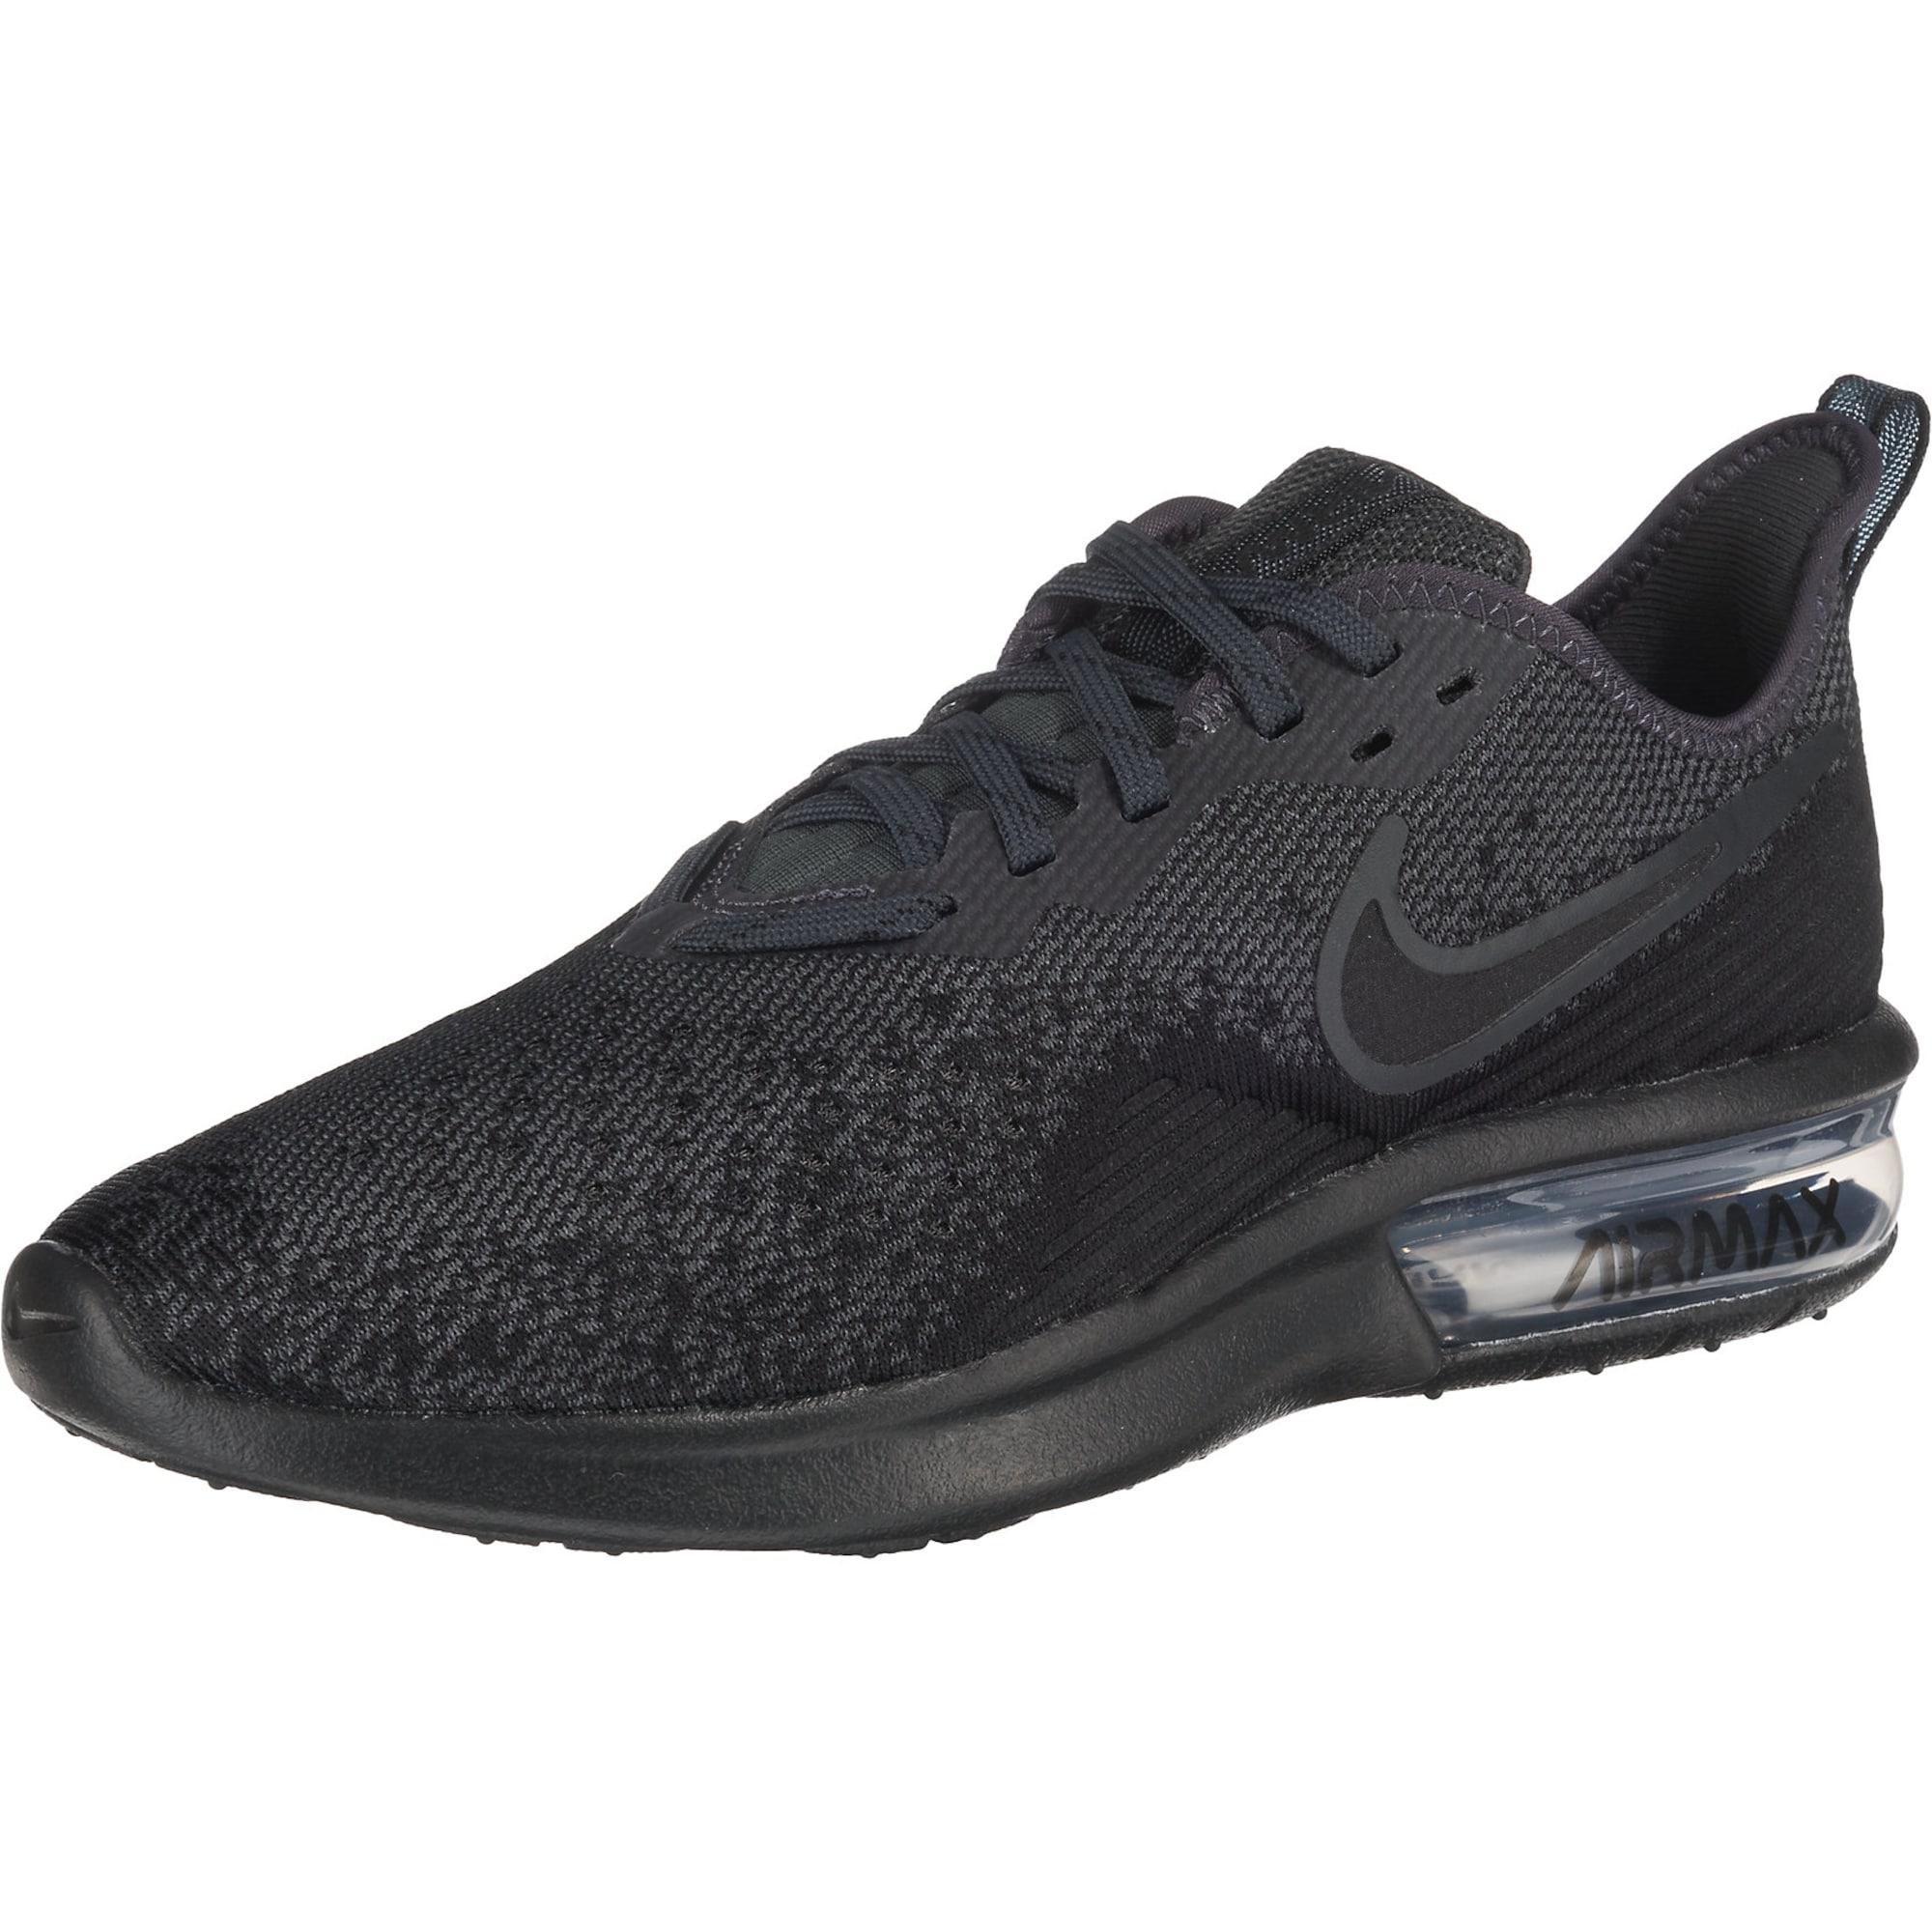 Sneaker 'Air Max Sequent 4' | Schuhe > Sneaker > Sneaker | Grau - Schwarz | Nike